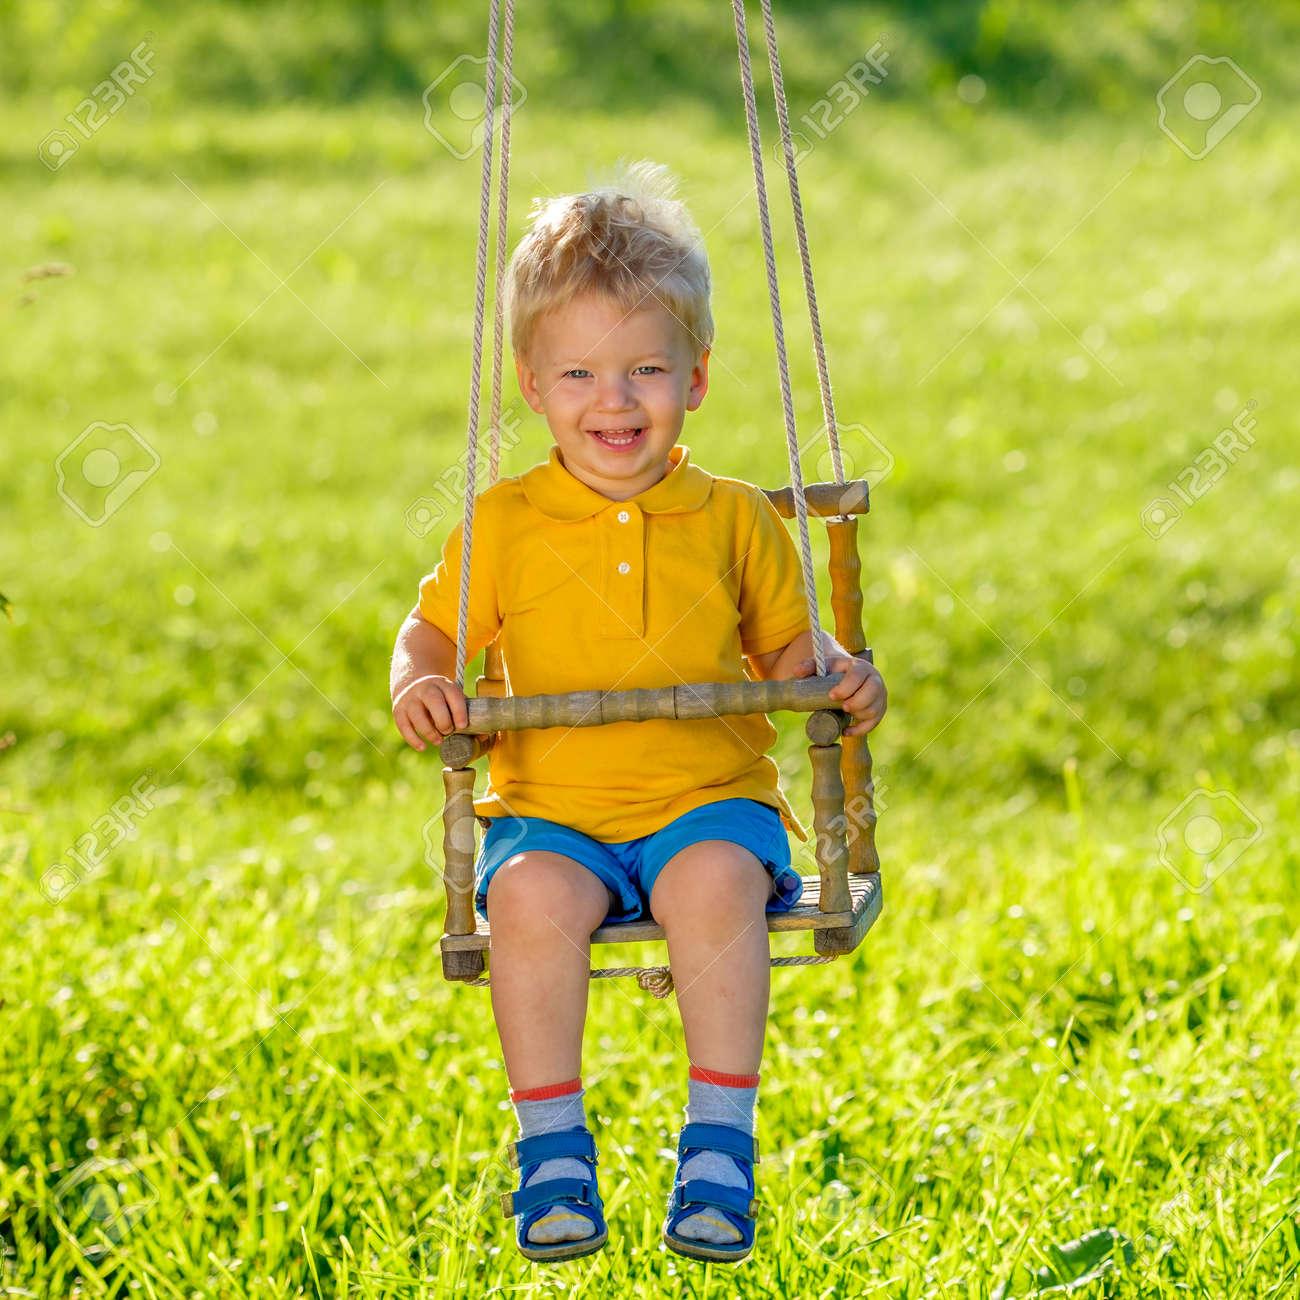 Is swinging healthy